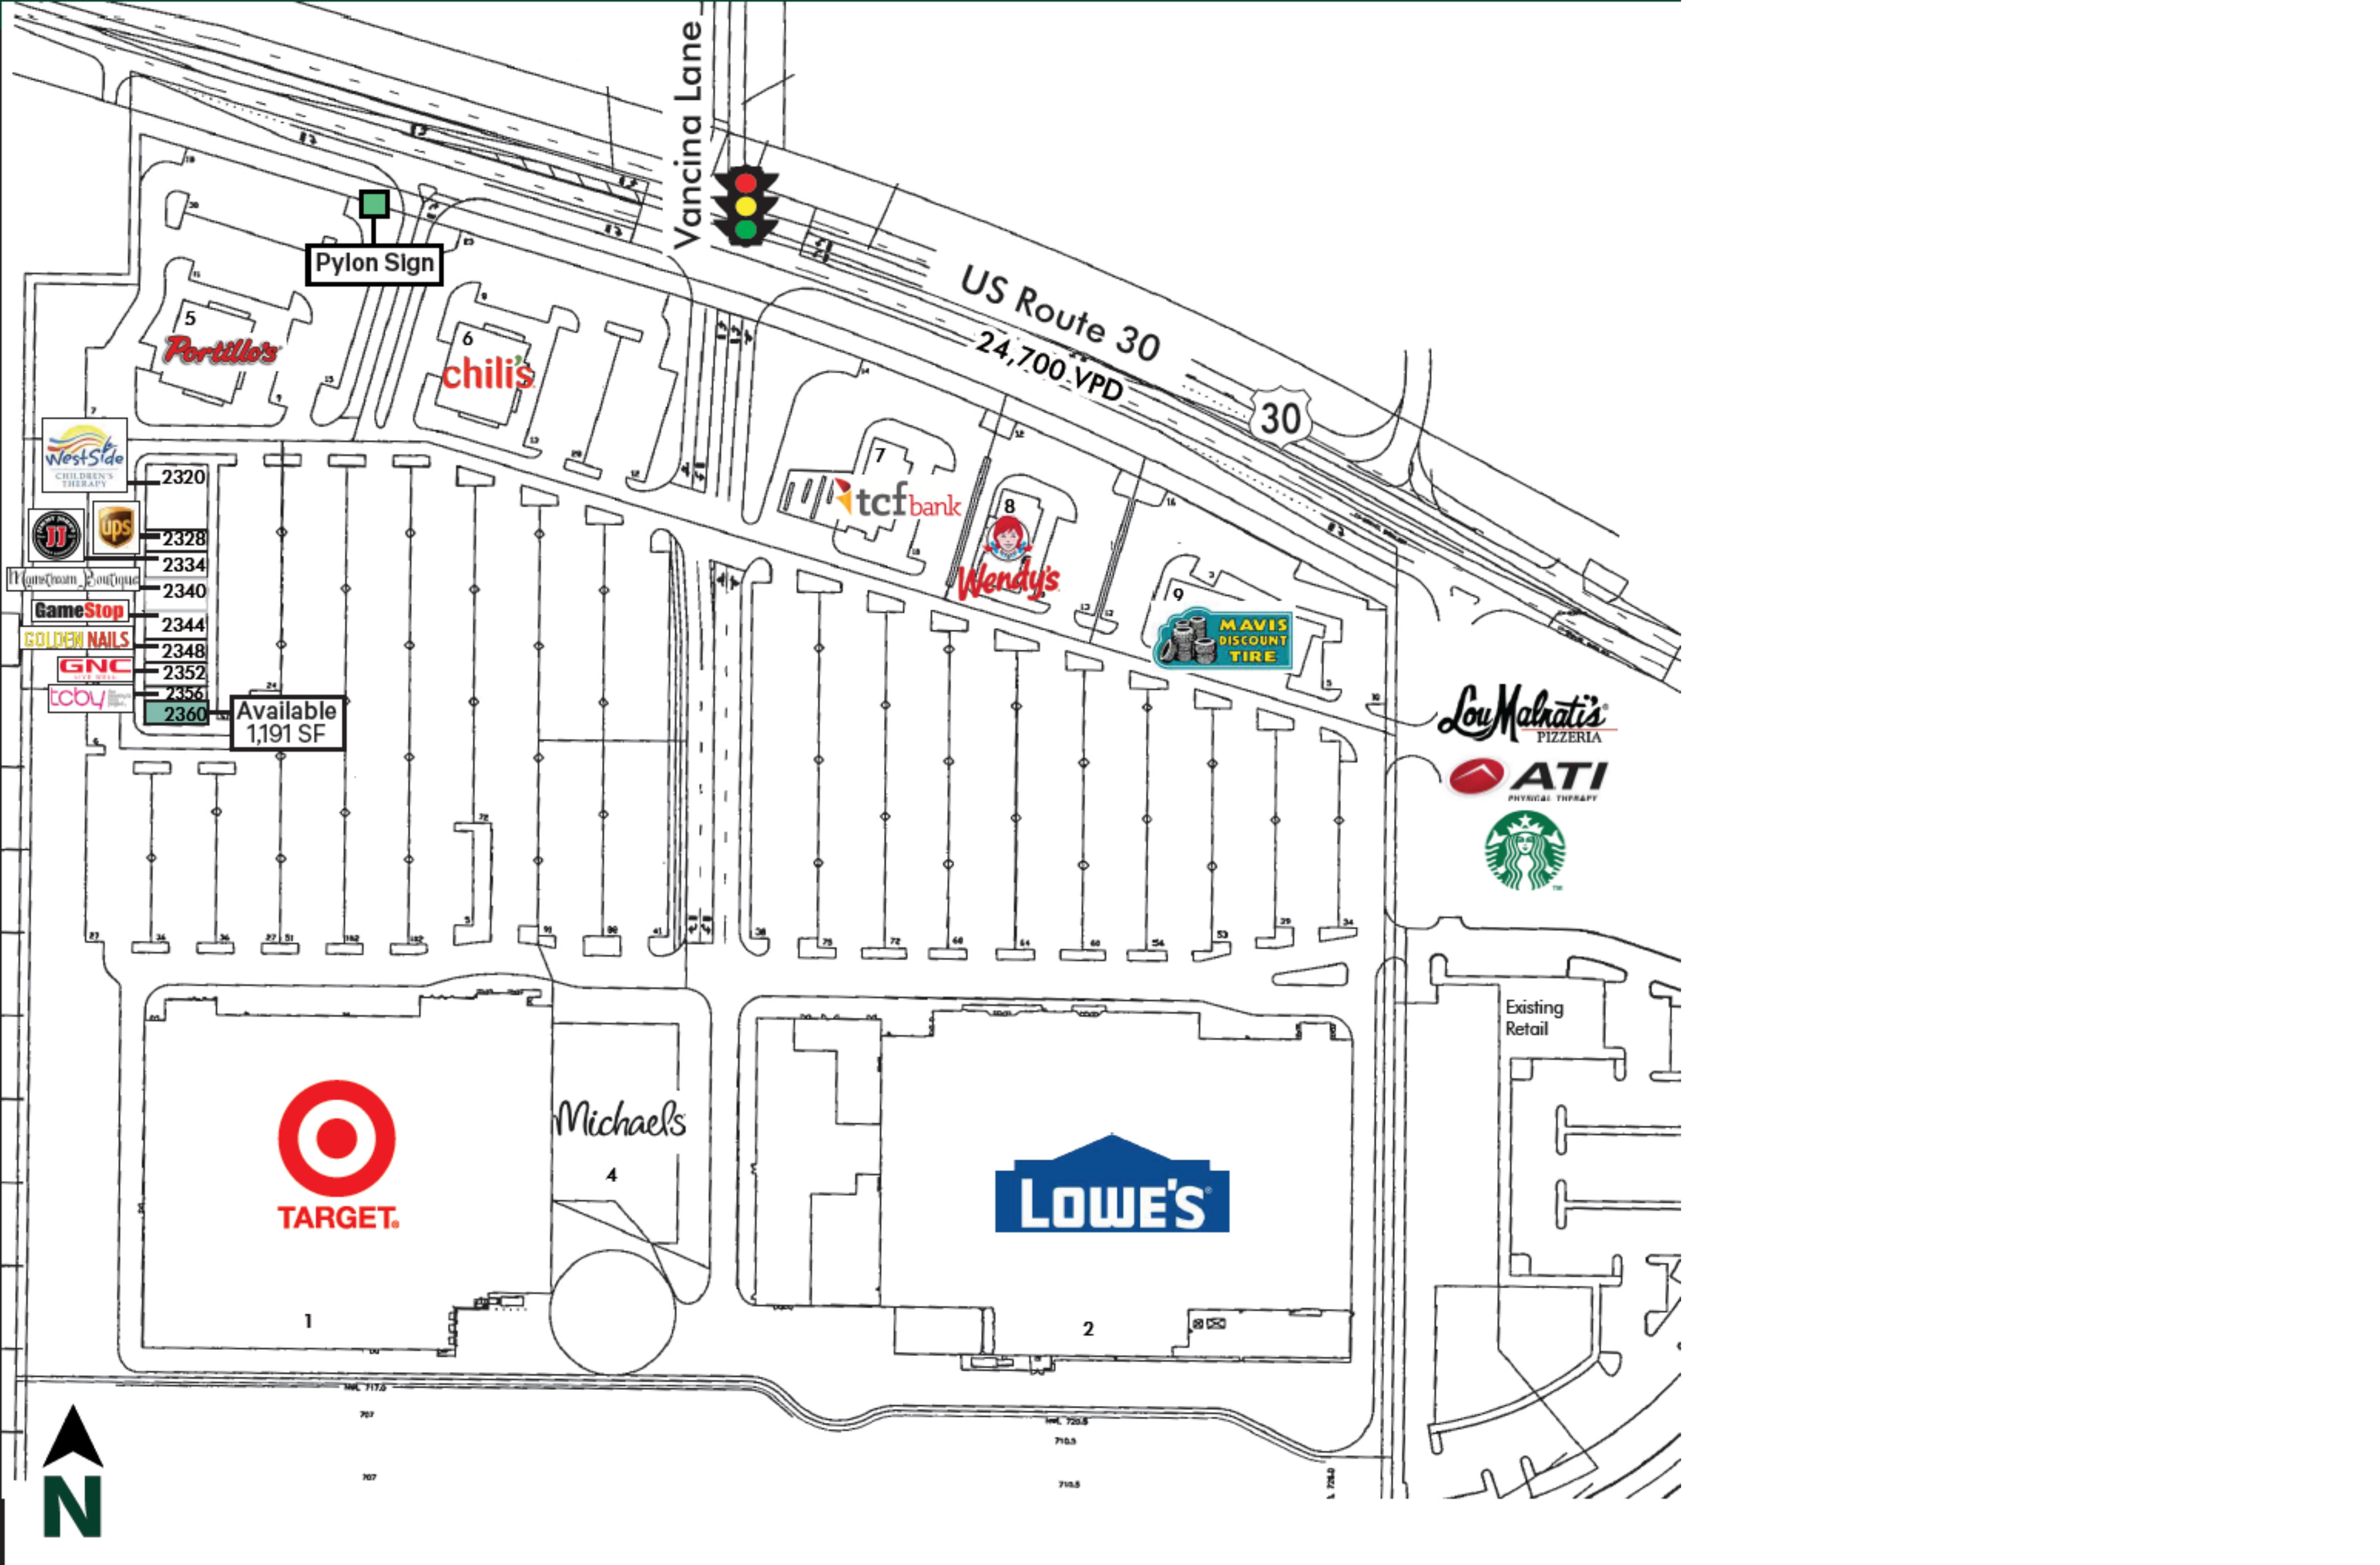 New Lenox Retail Center: site plan